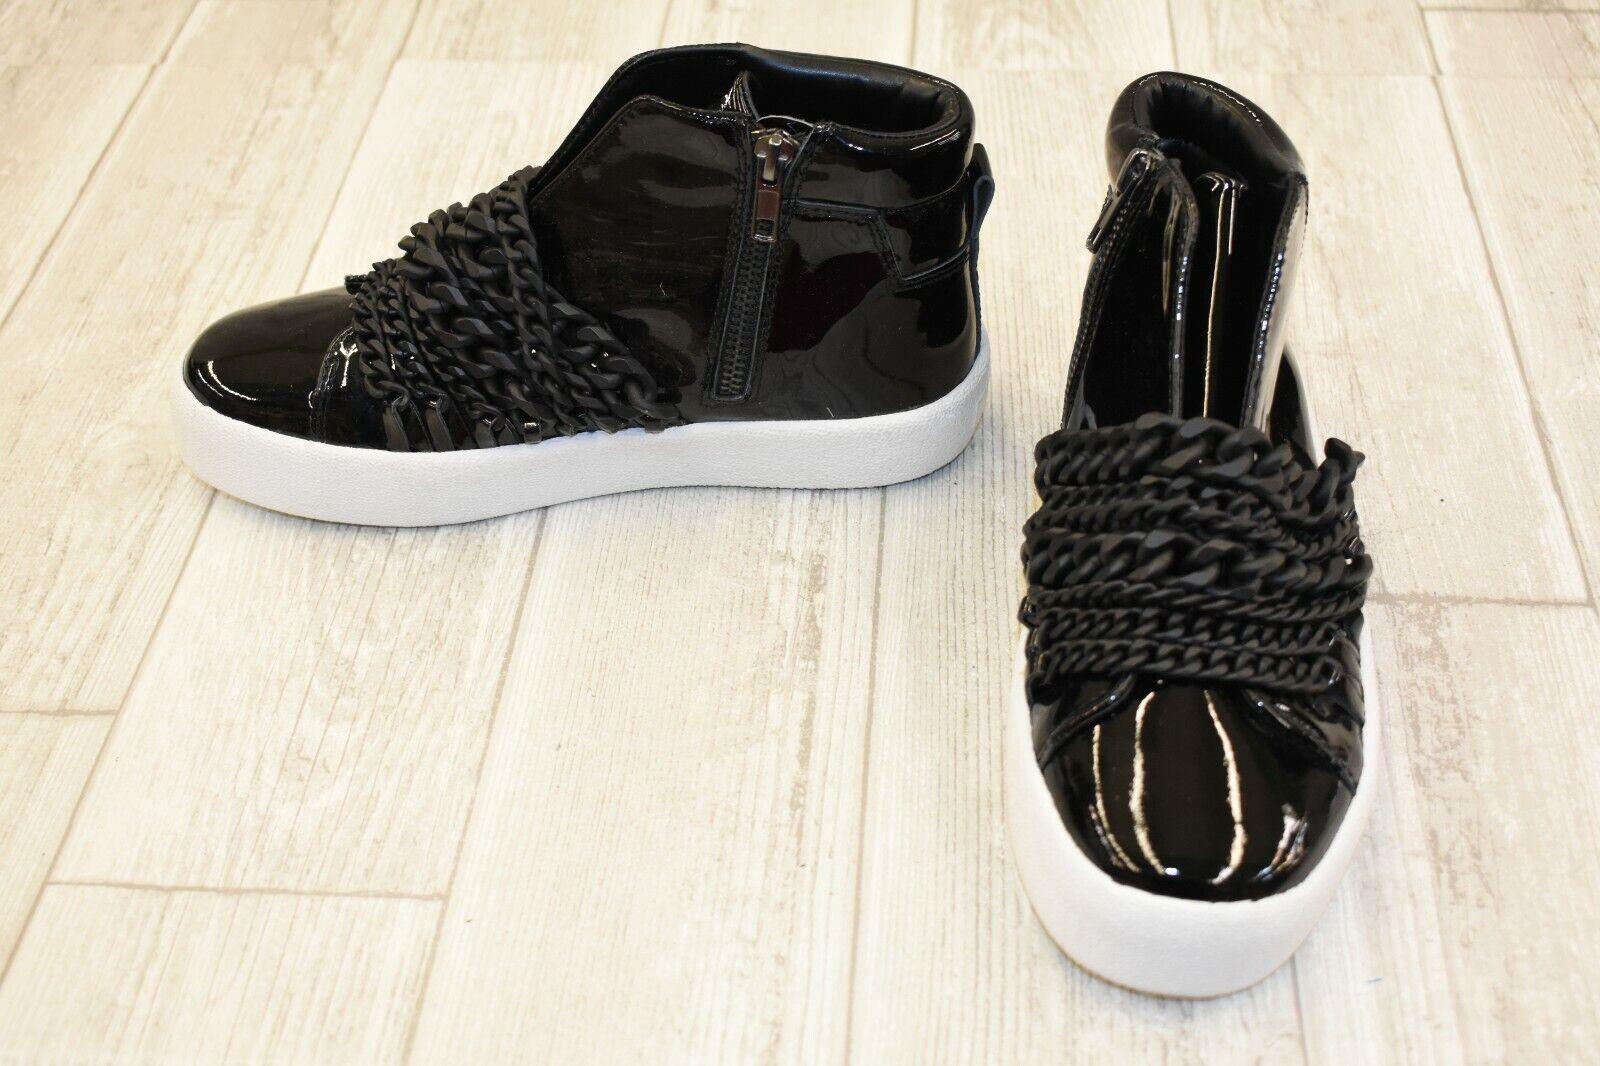 Kendall + Kylie Duke Cuir Verni Laceless Baskets, Femme Taille 6.5 m, noir